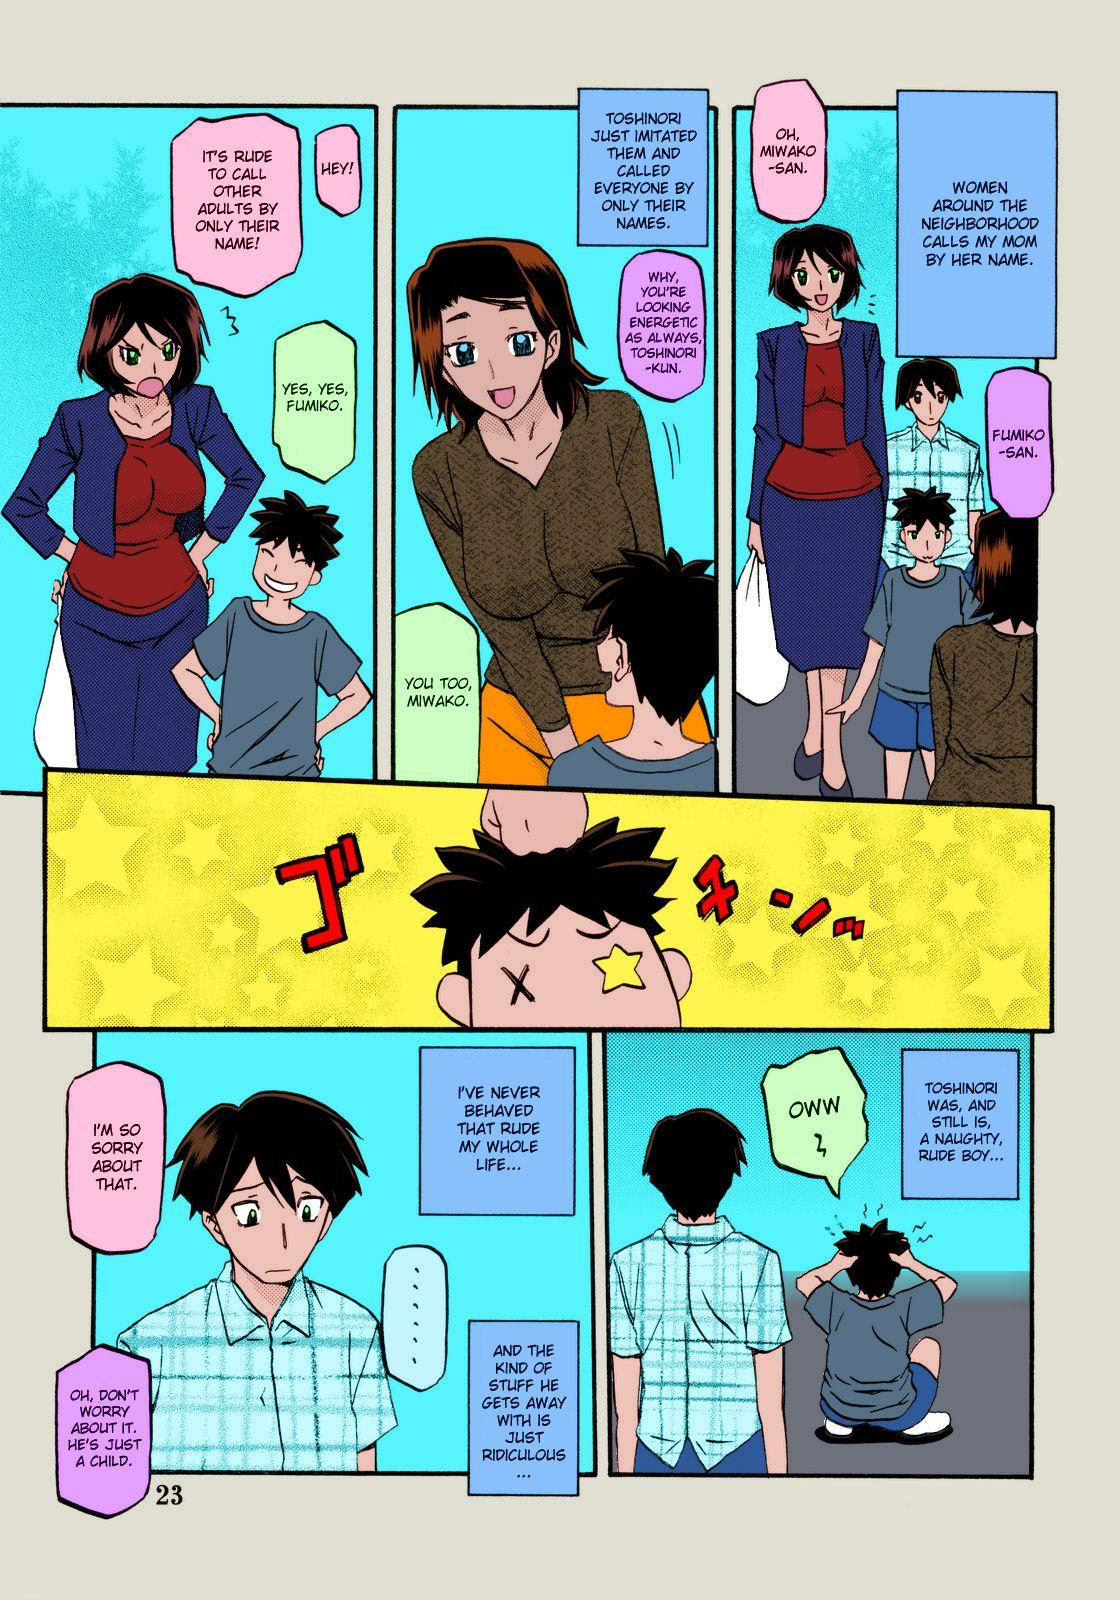 Akebi no Mi - Fumiko 22